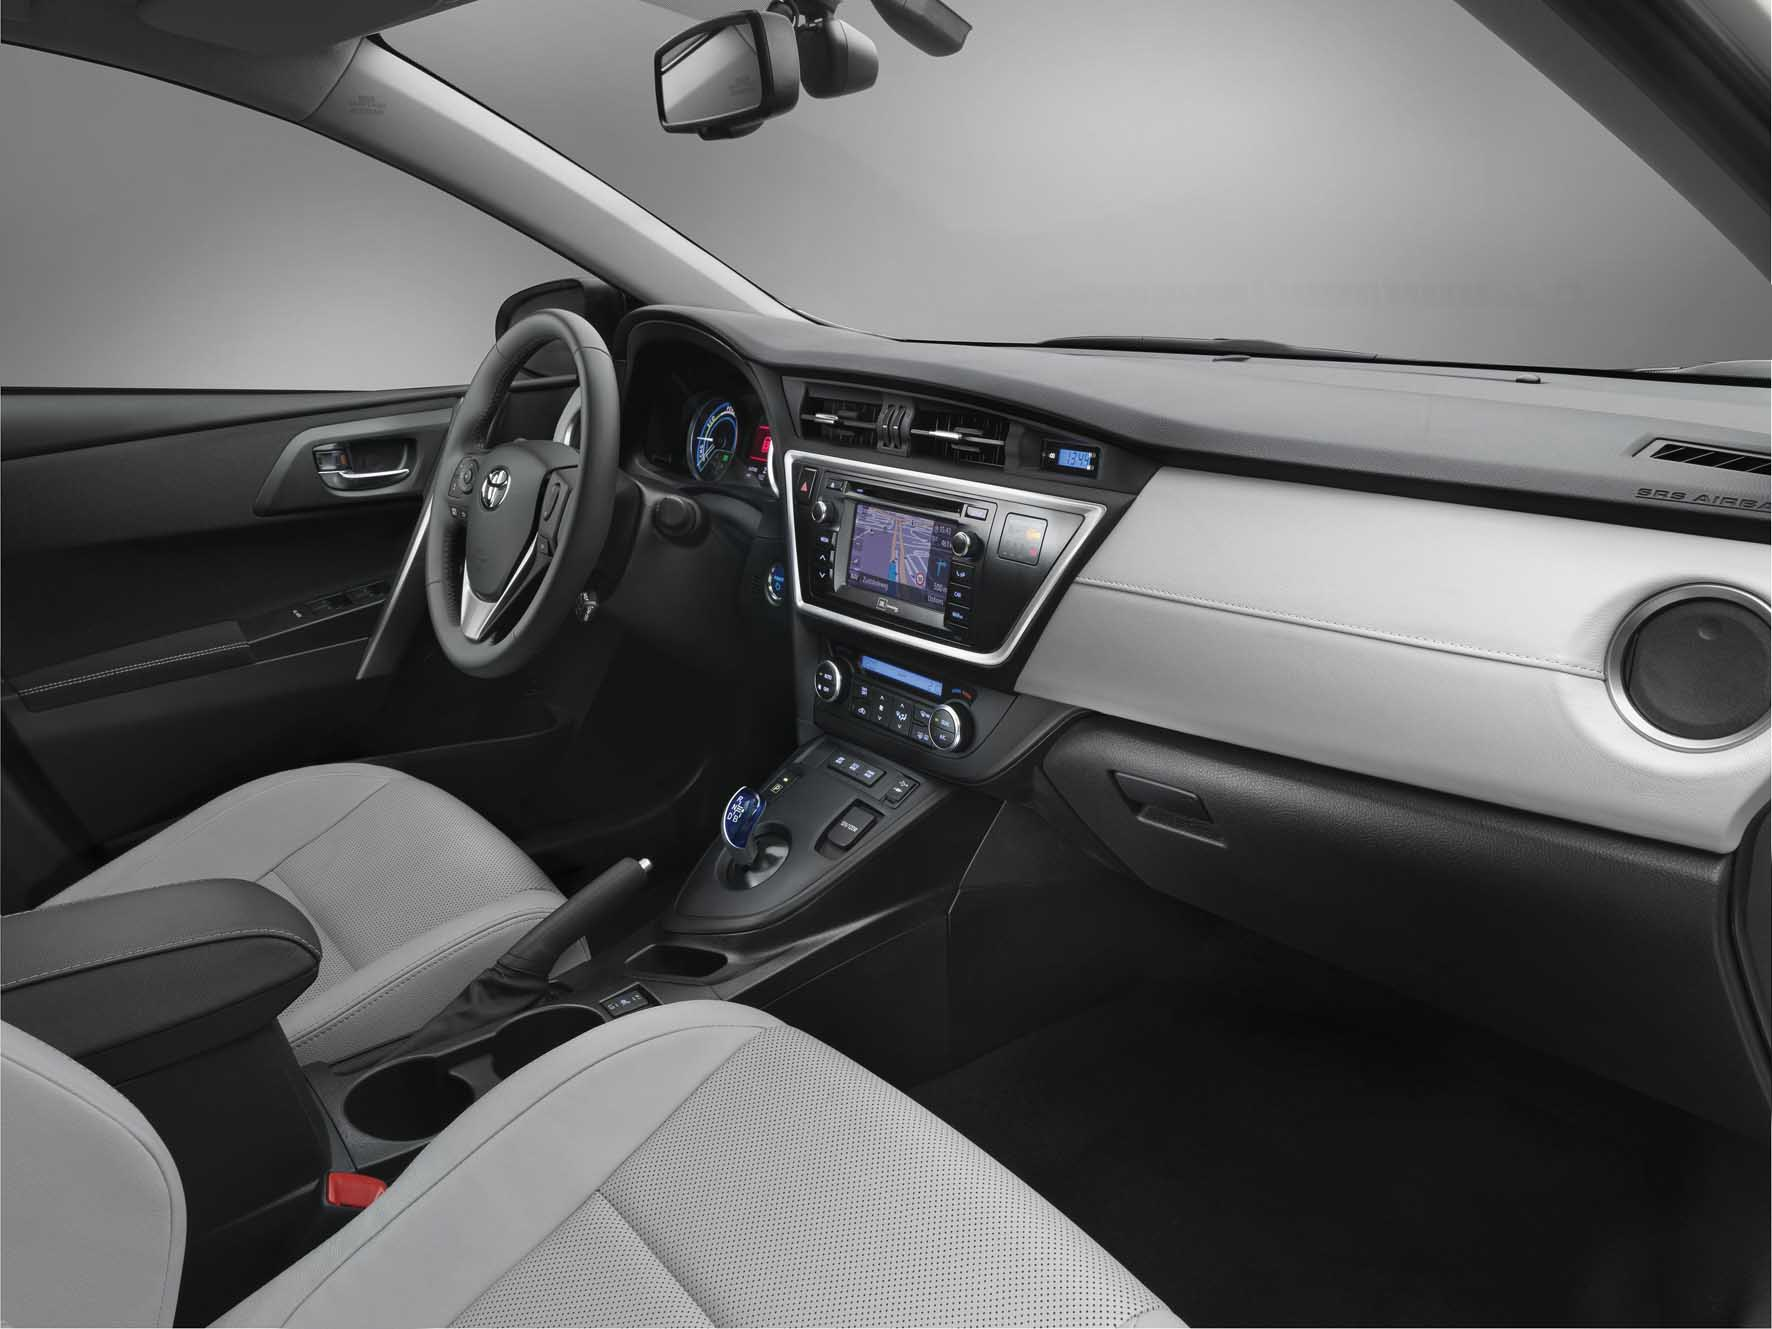 Toyota 2012 nuova Auris interni 1